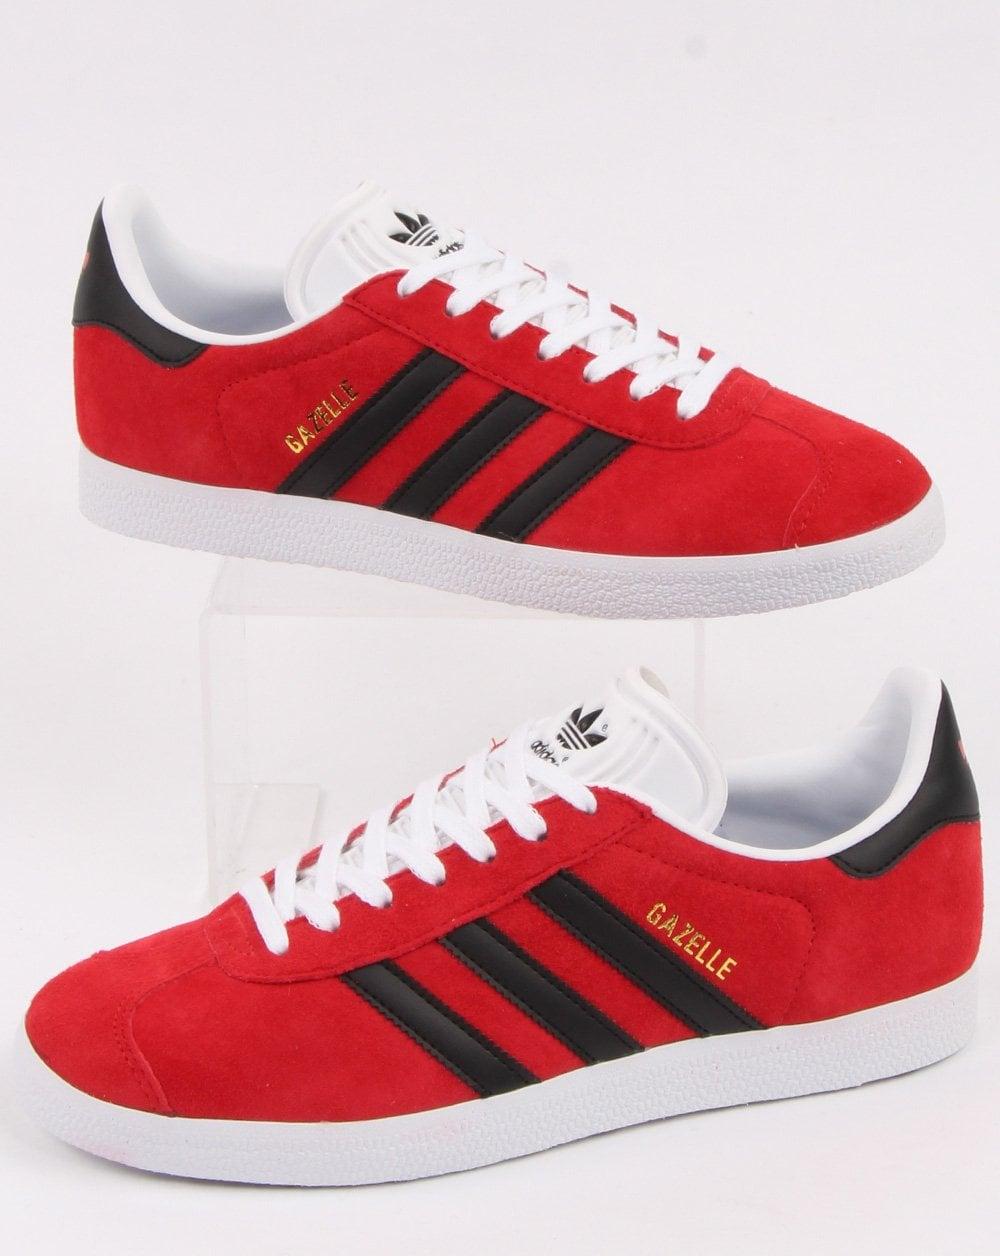 Adidas Gazelle Trainers Red/Black